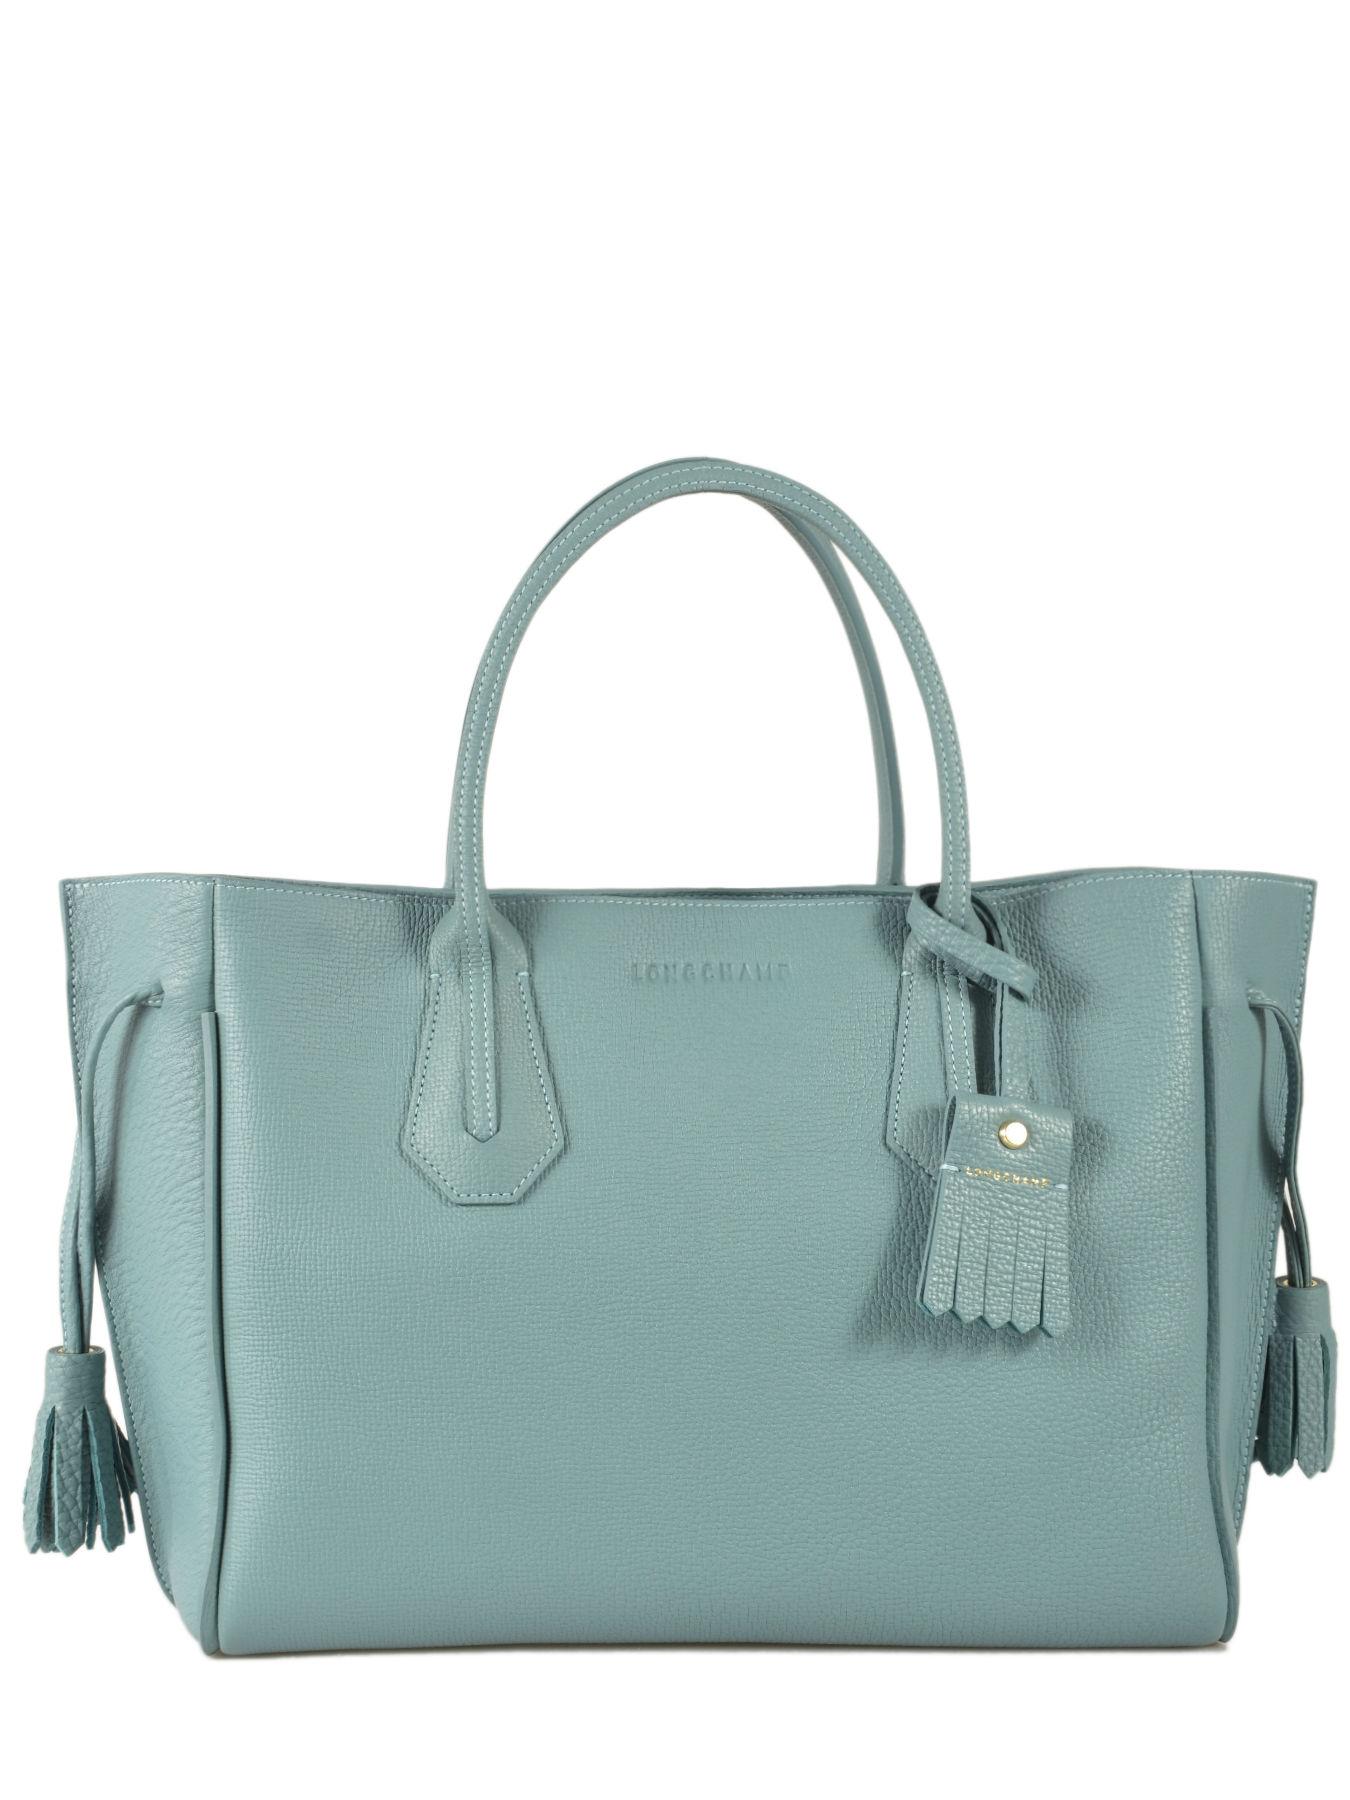 Longchamps Penelope